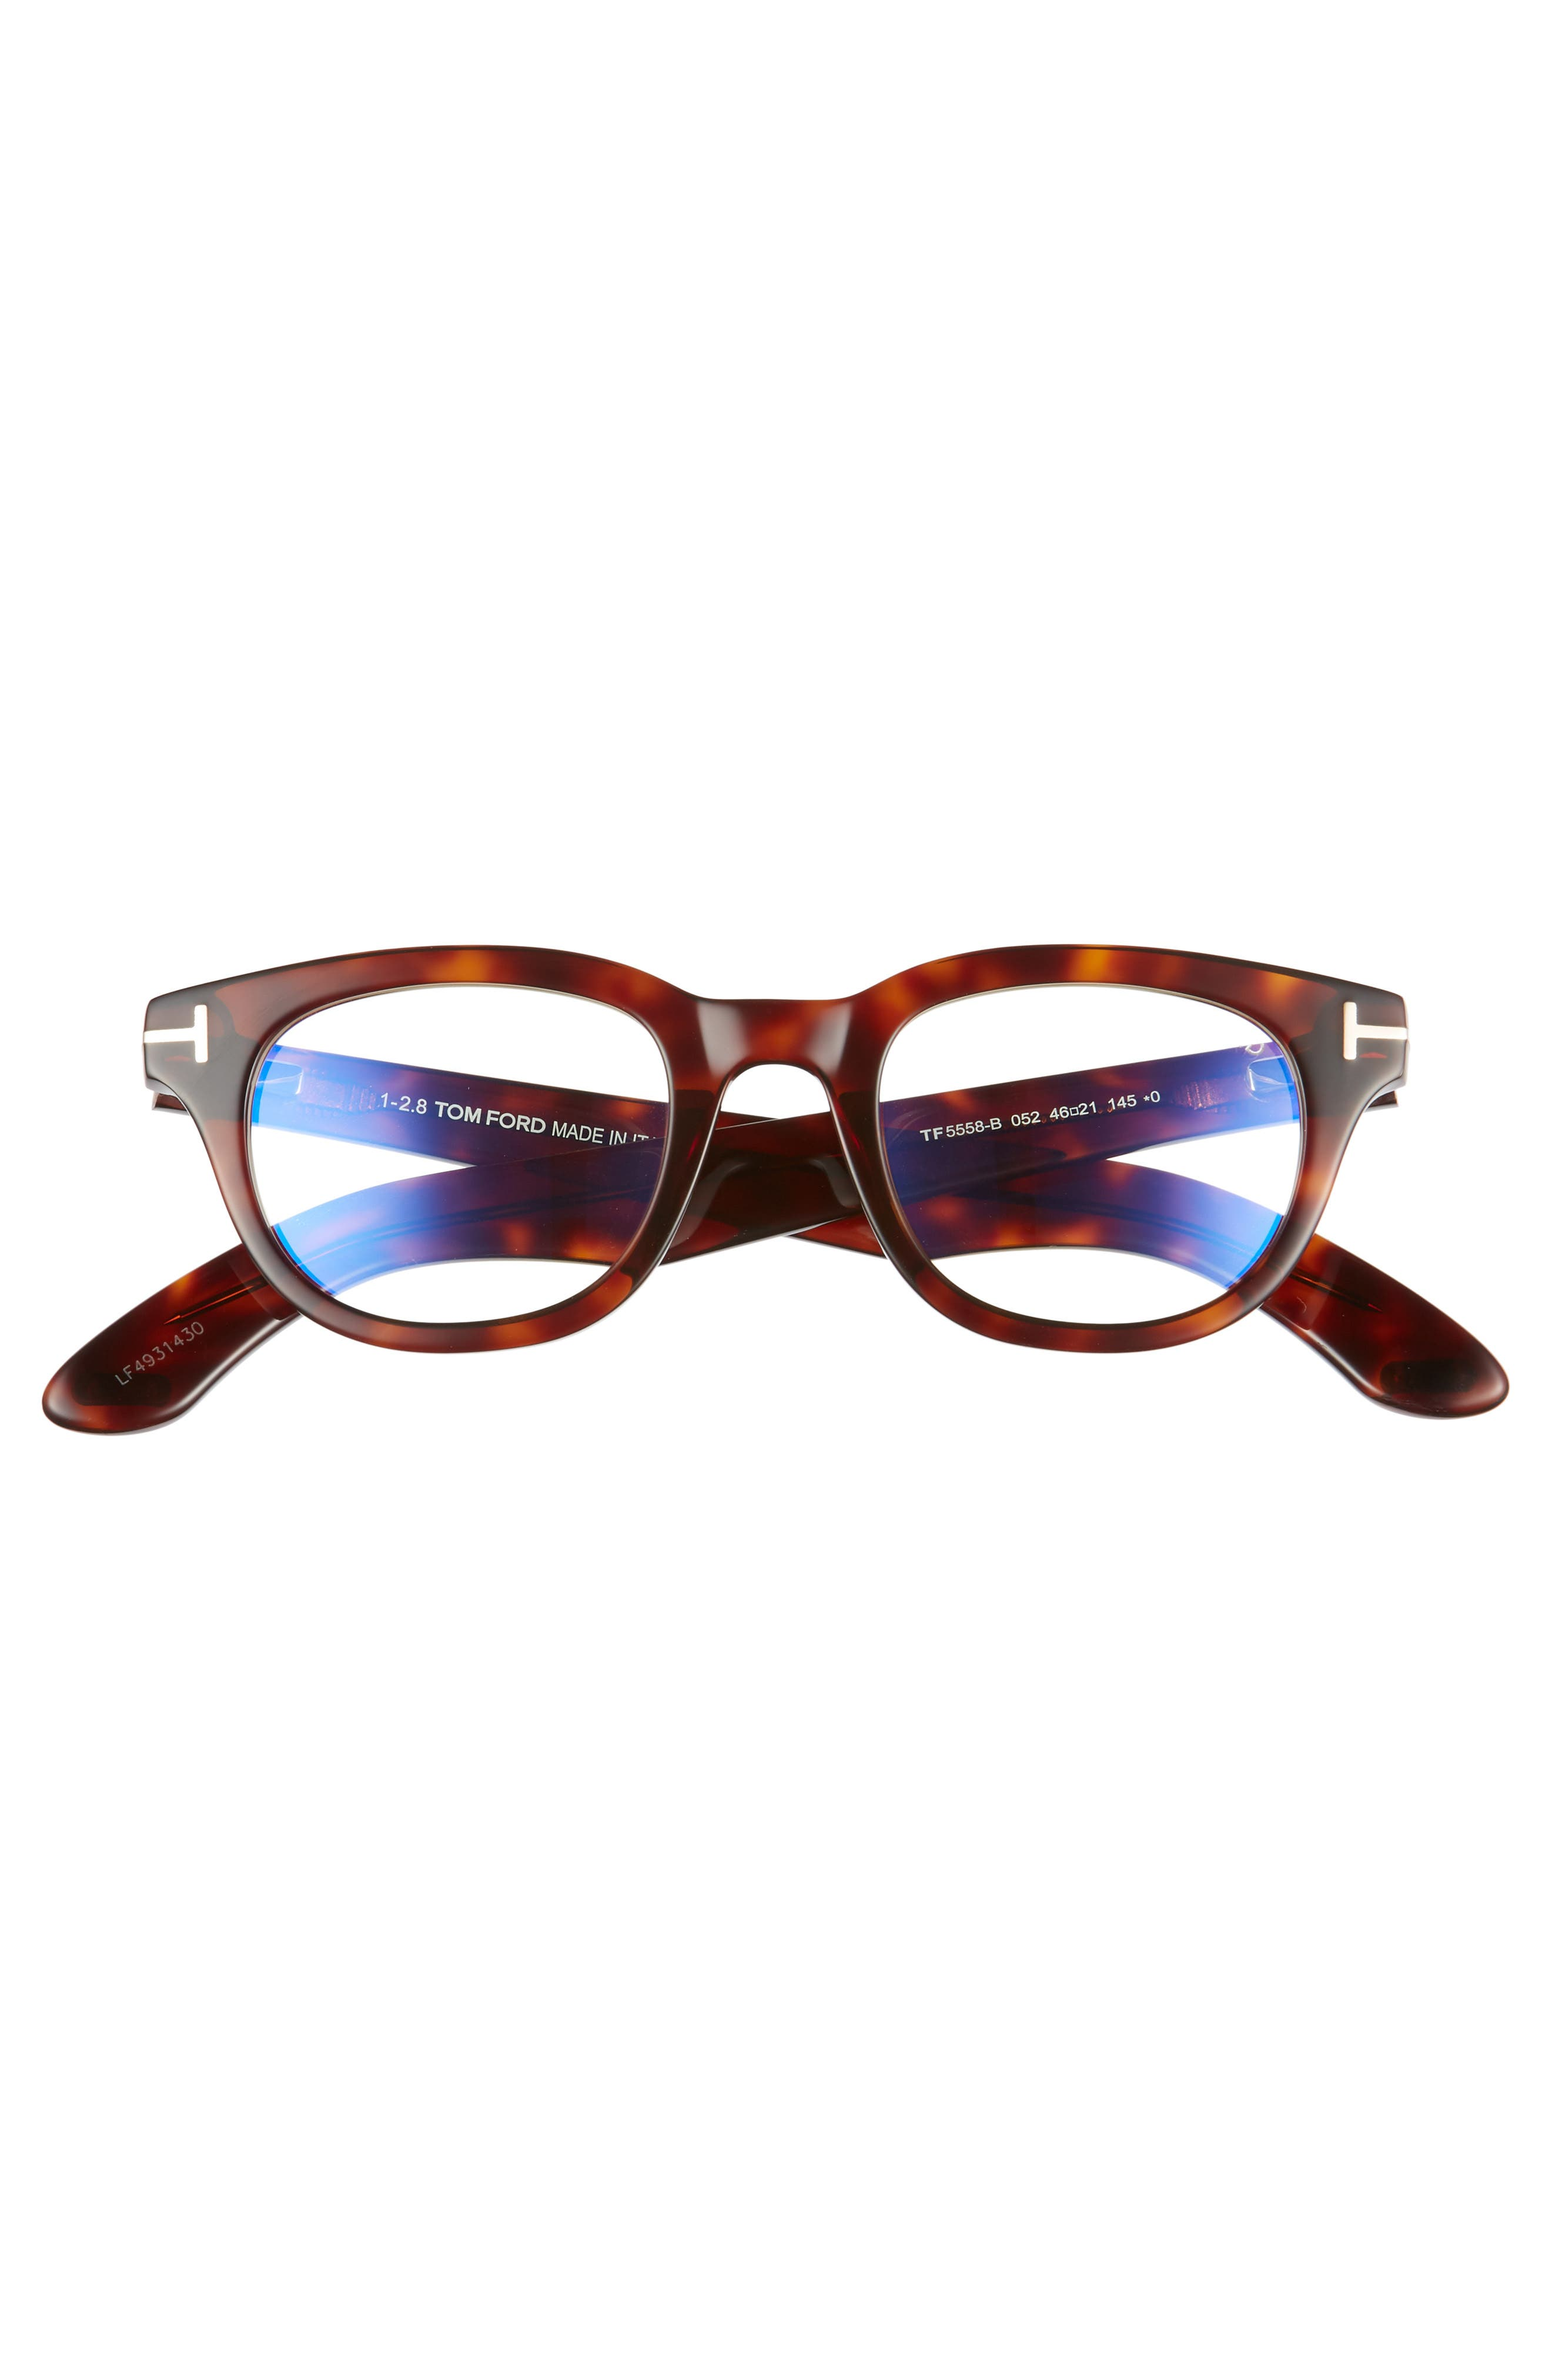 46mm Blue Light Blocking Glasses,                             Alternate thumbnail 3, color,                             SHINY DARK HAVANA/ ROSE GOLD